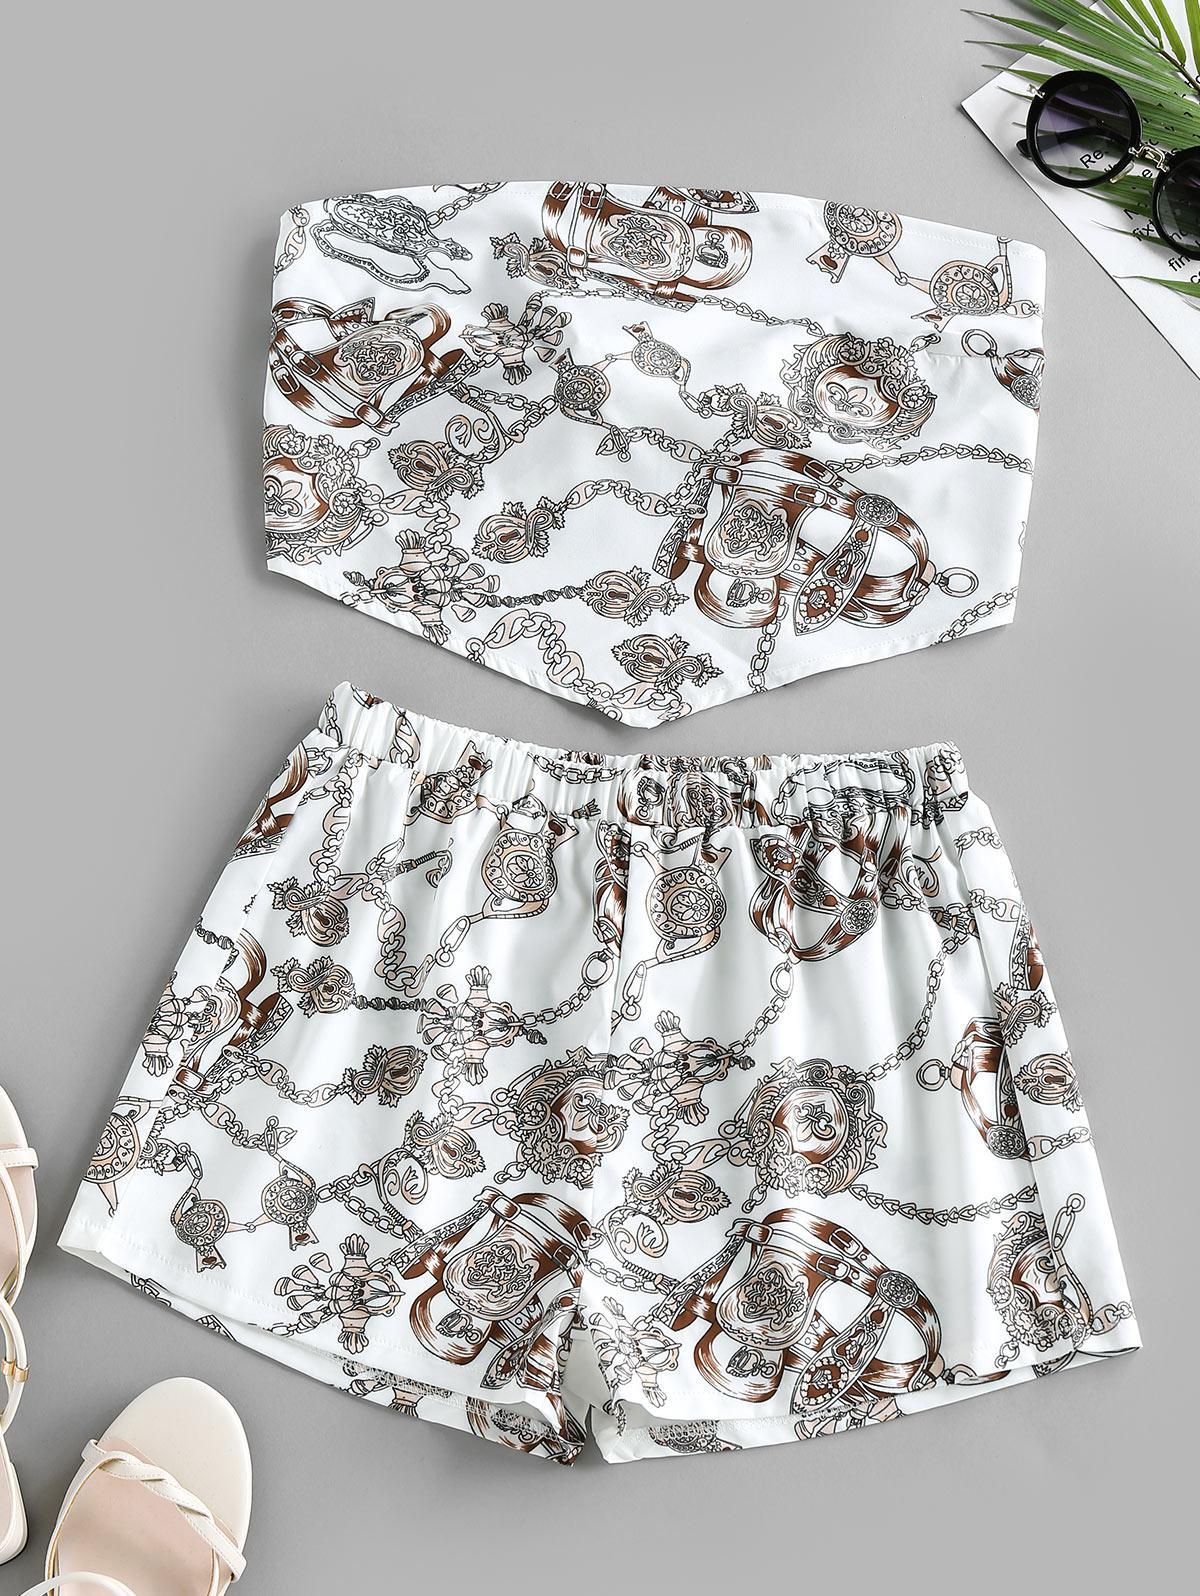 ZAFUL Chain Print Strapless Bandana Top with Shorts